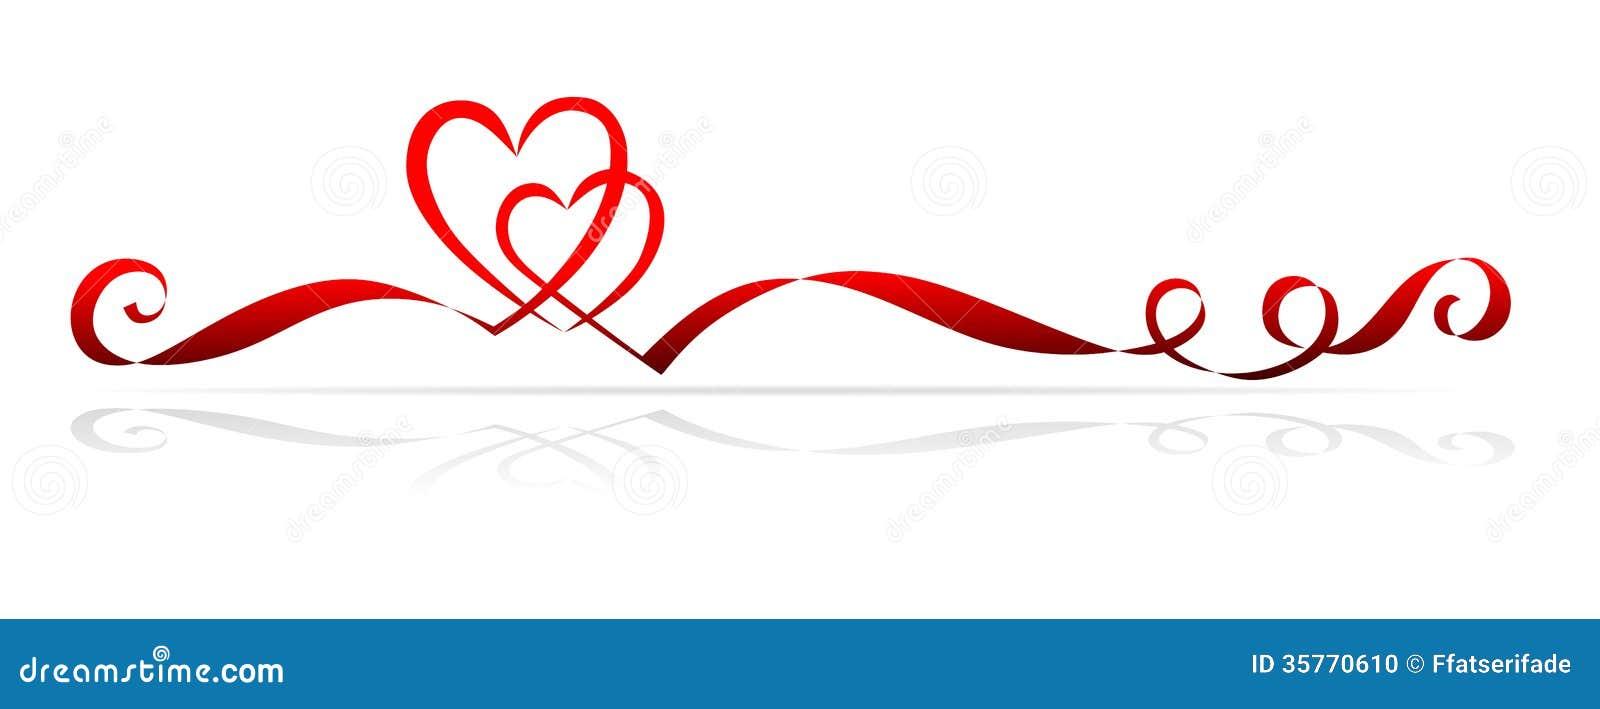 Simple Heart Stock Photo Image 35770610